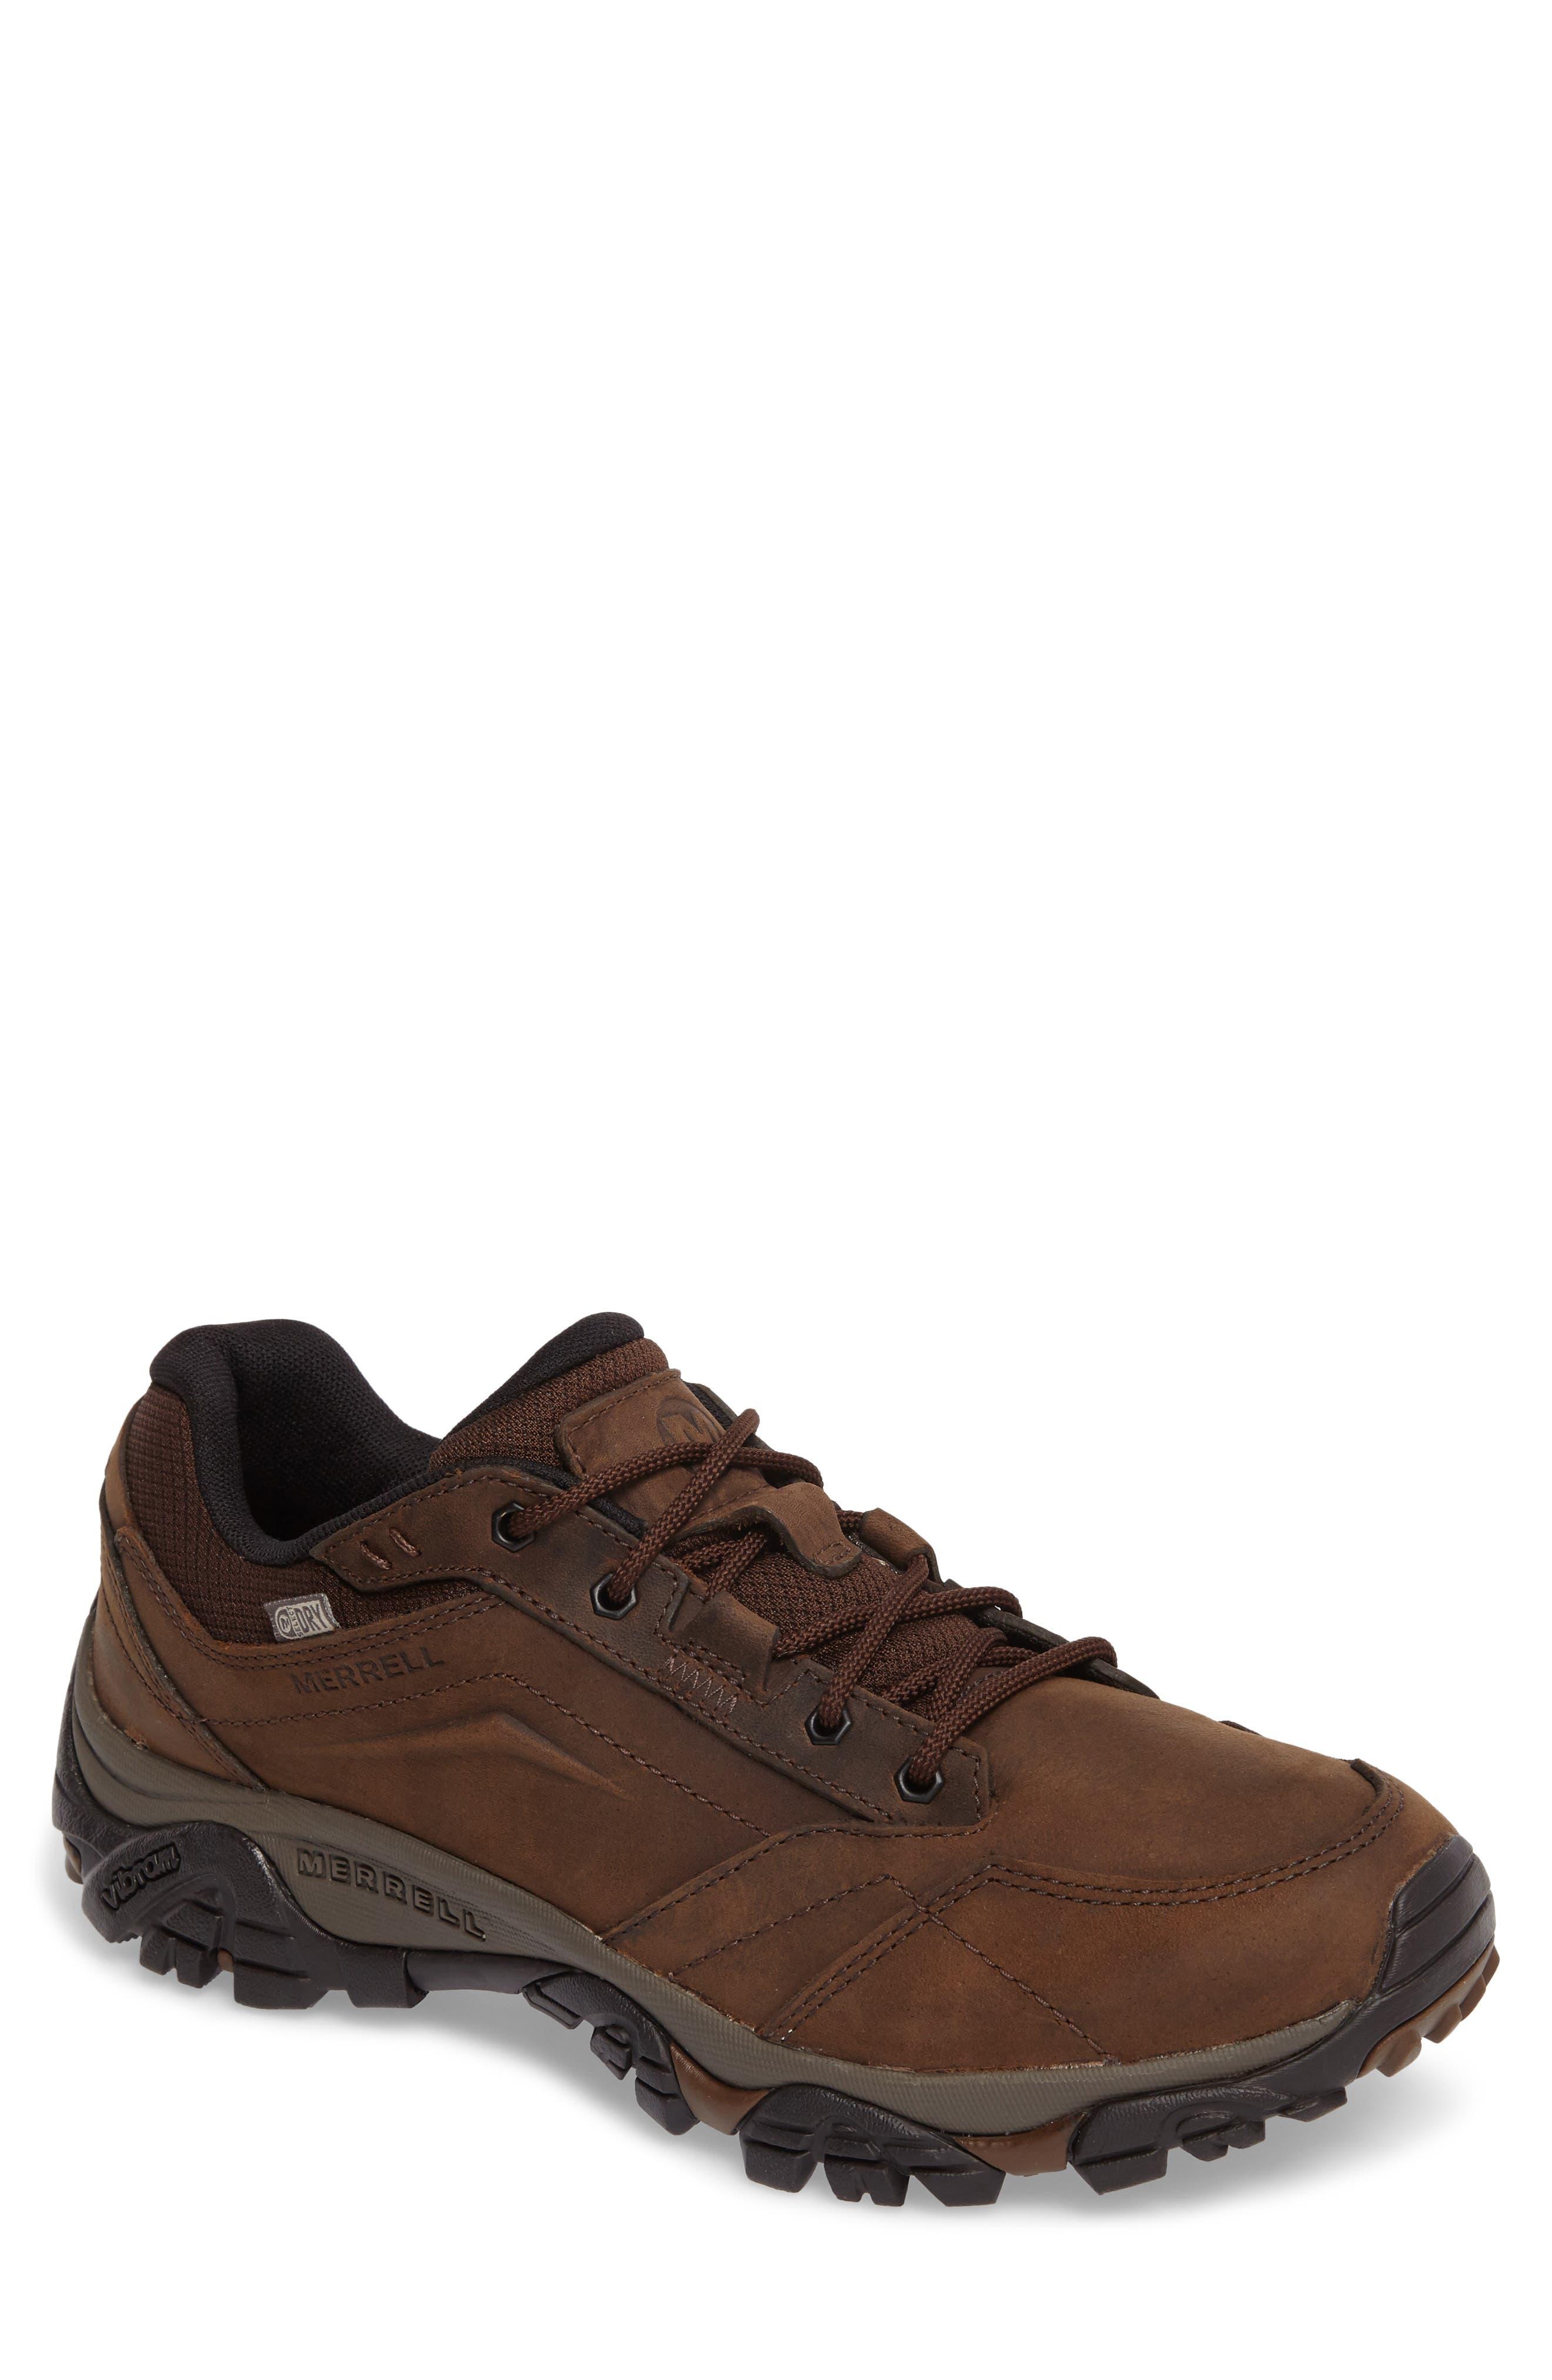 Moab Adventure Hiking Shoe